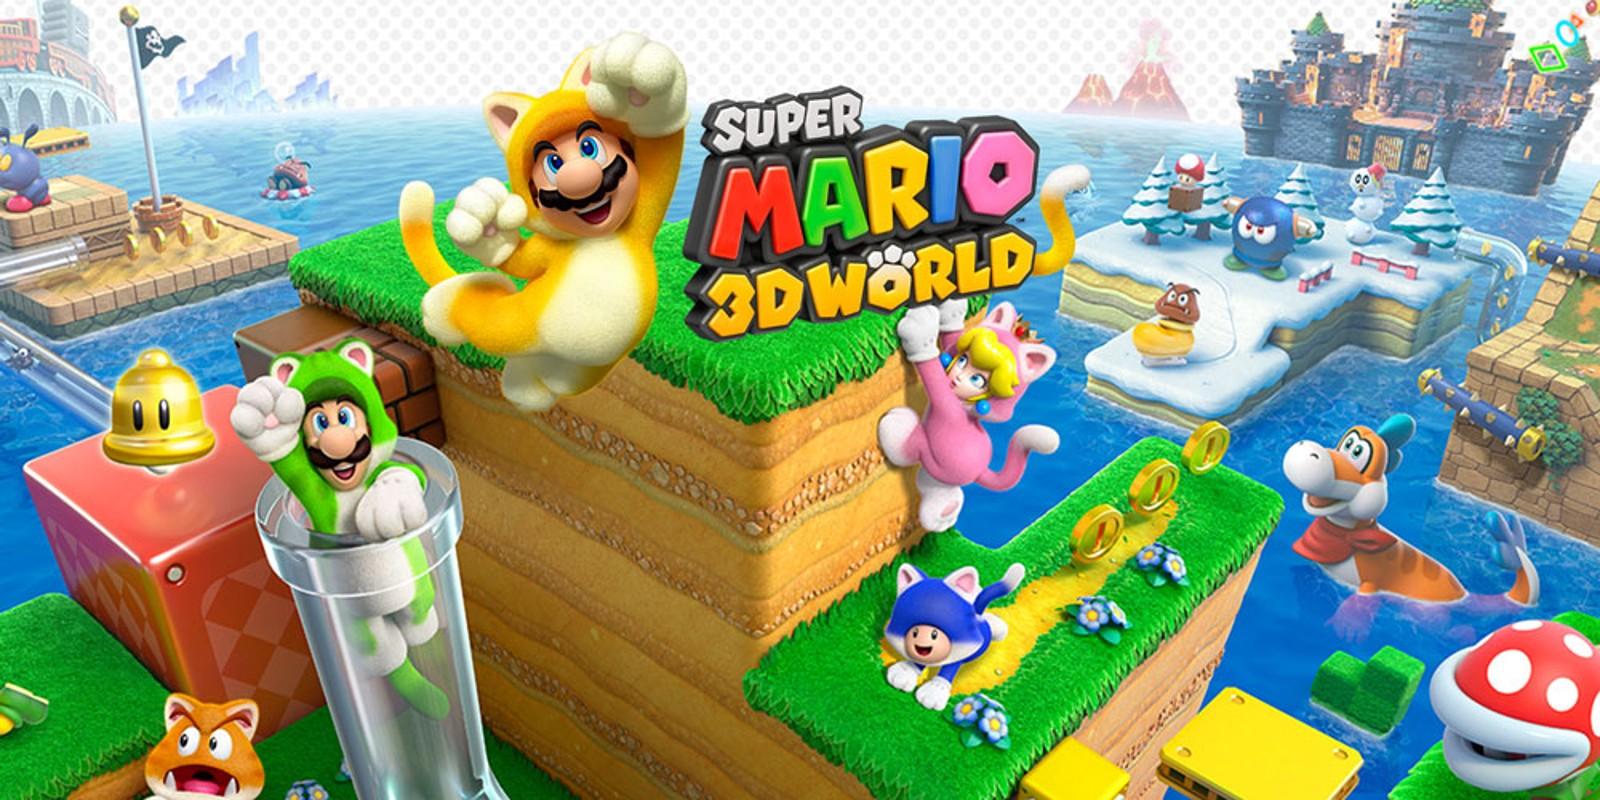 SUPER MARIO 3D WORLD | Wii U | Games | Nintendo